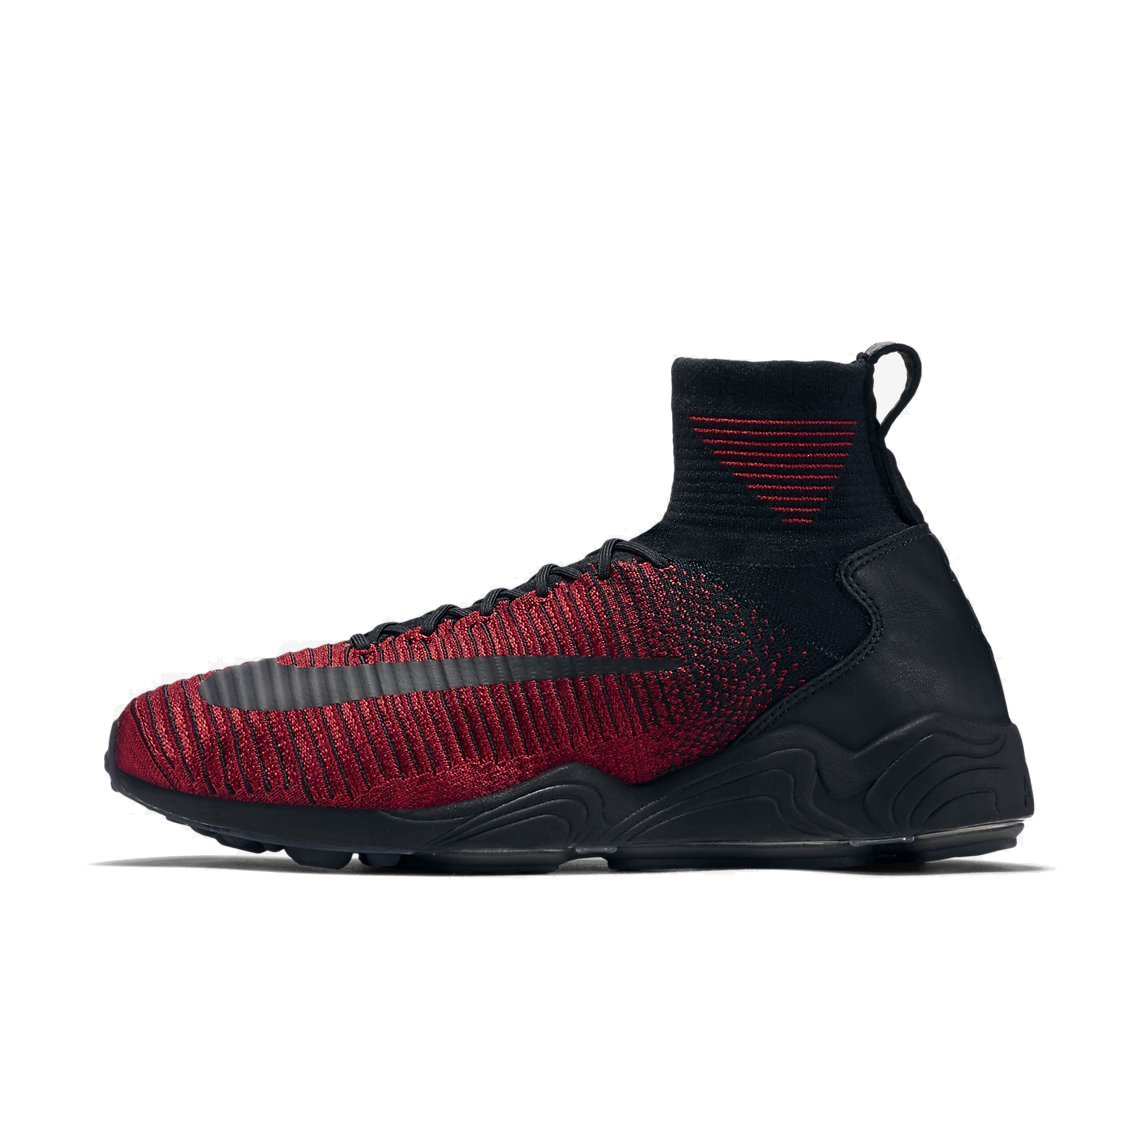 Nike Herren 852616-600 Turnschuhe  40 EU|Rot